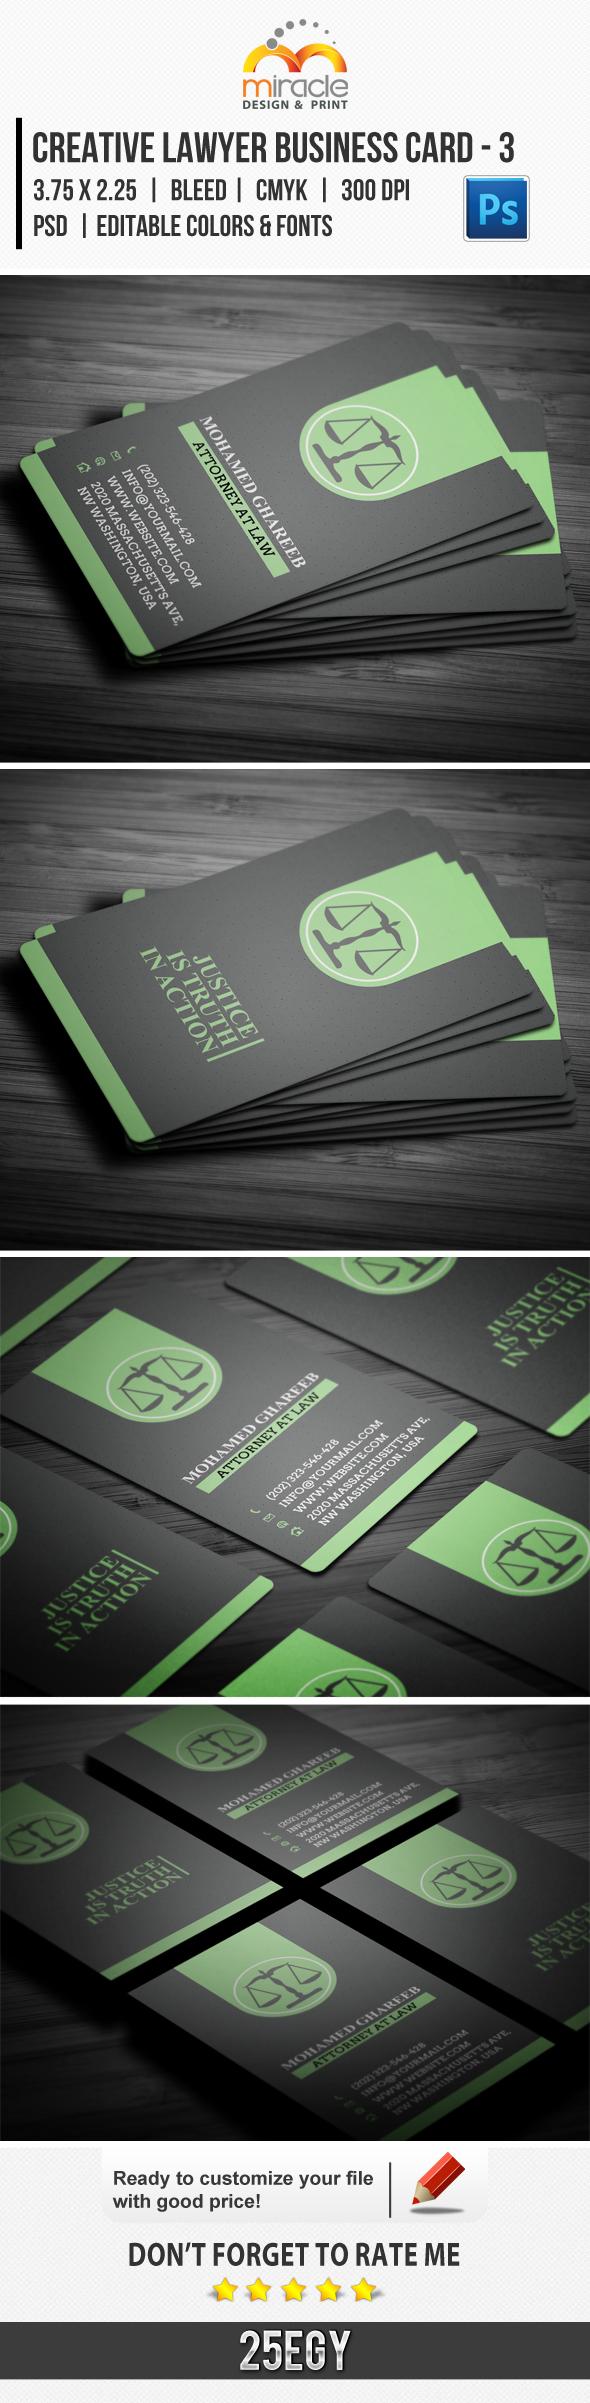 Creative Lawyer Business Card #3 by EgYpToS on DeviantArt